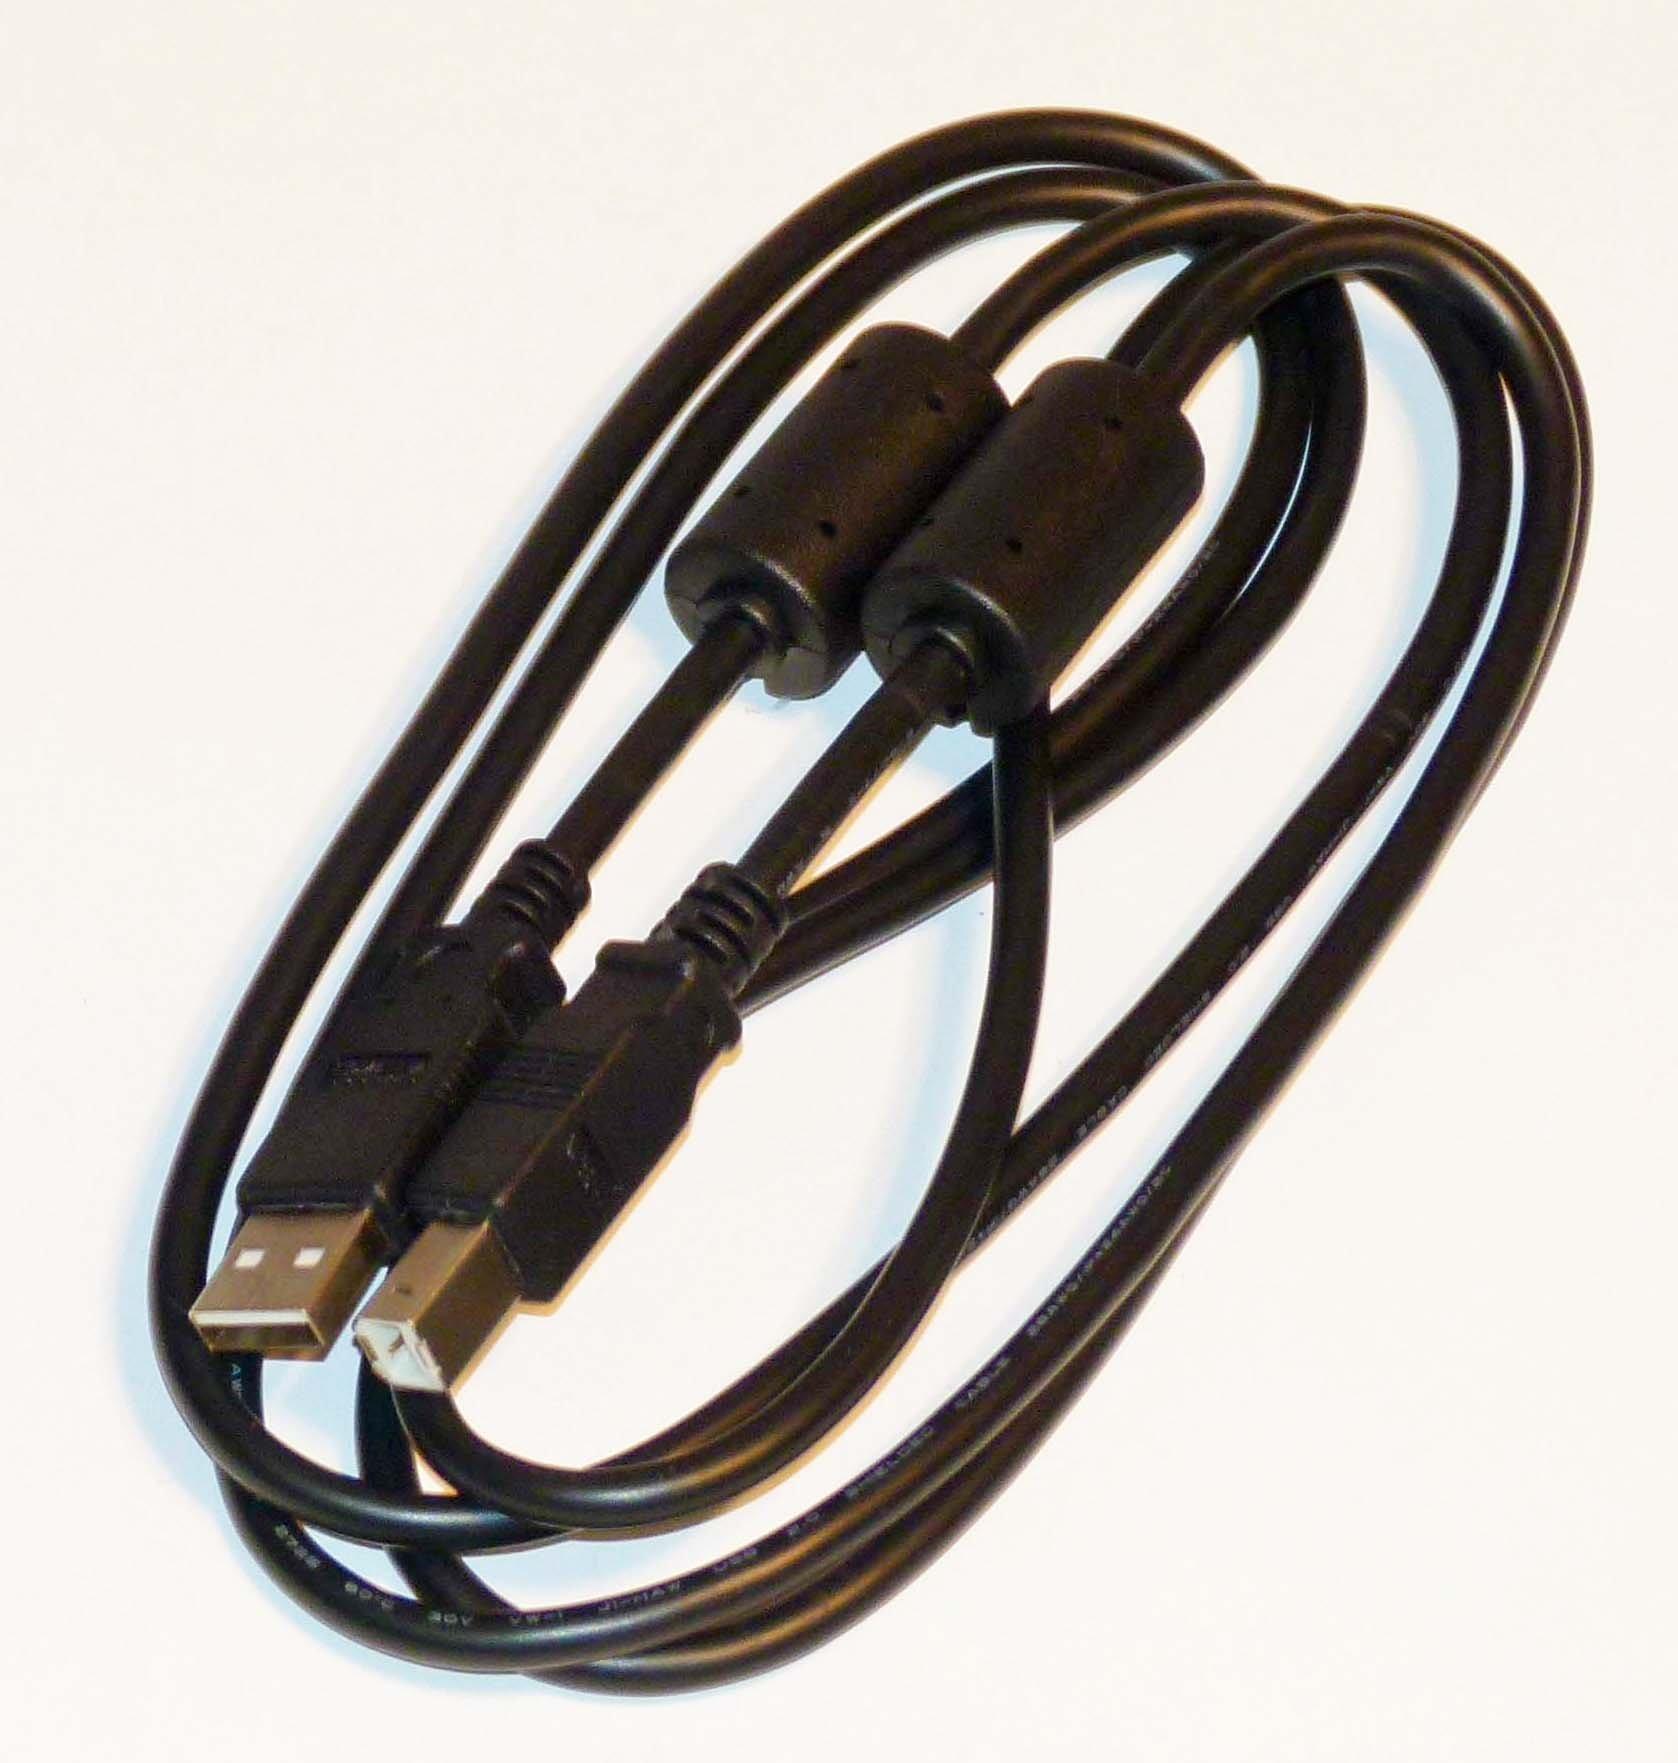 OEM Epson 70 Inch USB Connection Cable For Epson Perfection V550, V600, V30, V300, V500 by Epson